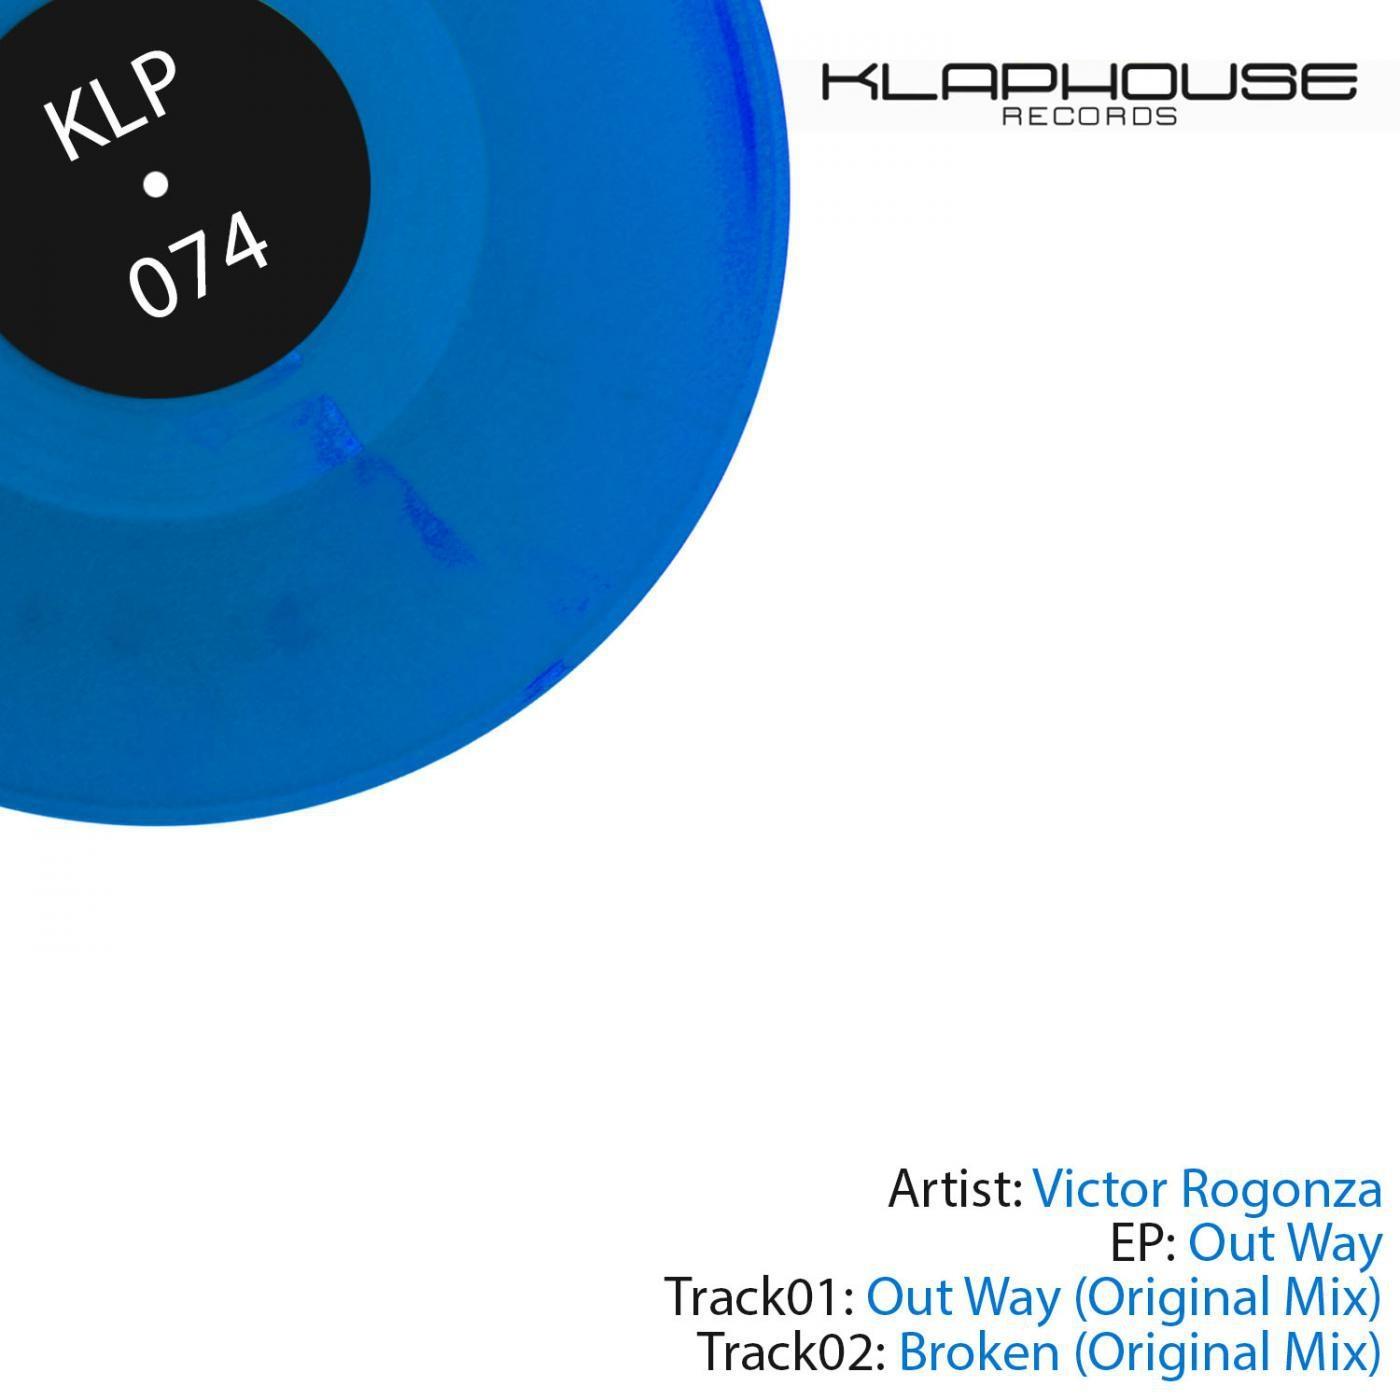 Victor Rogonza - Out Way (Original mix)